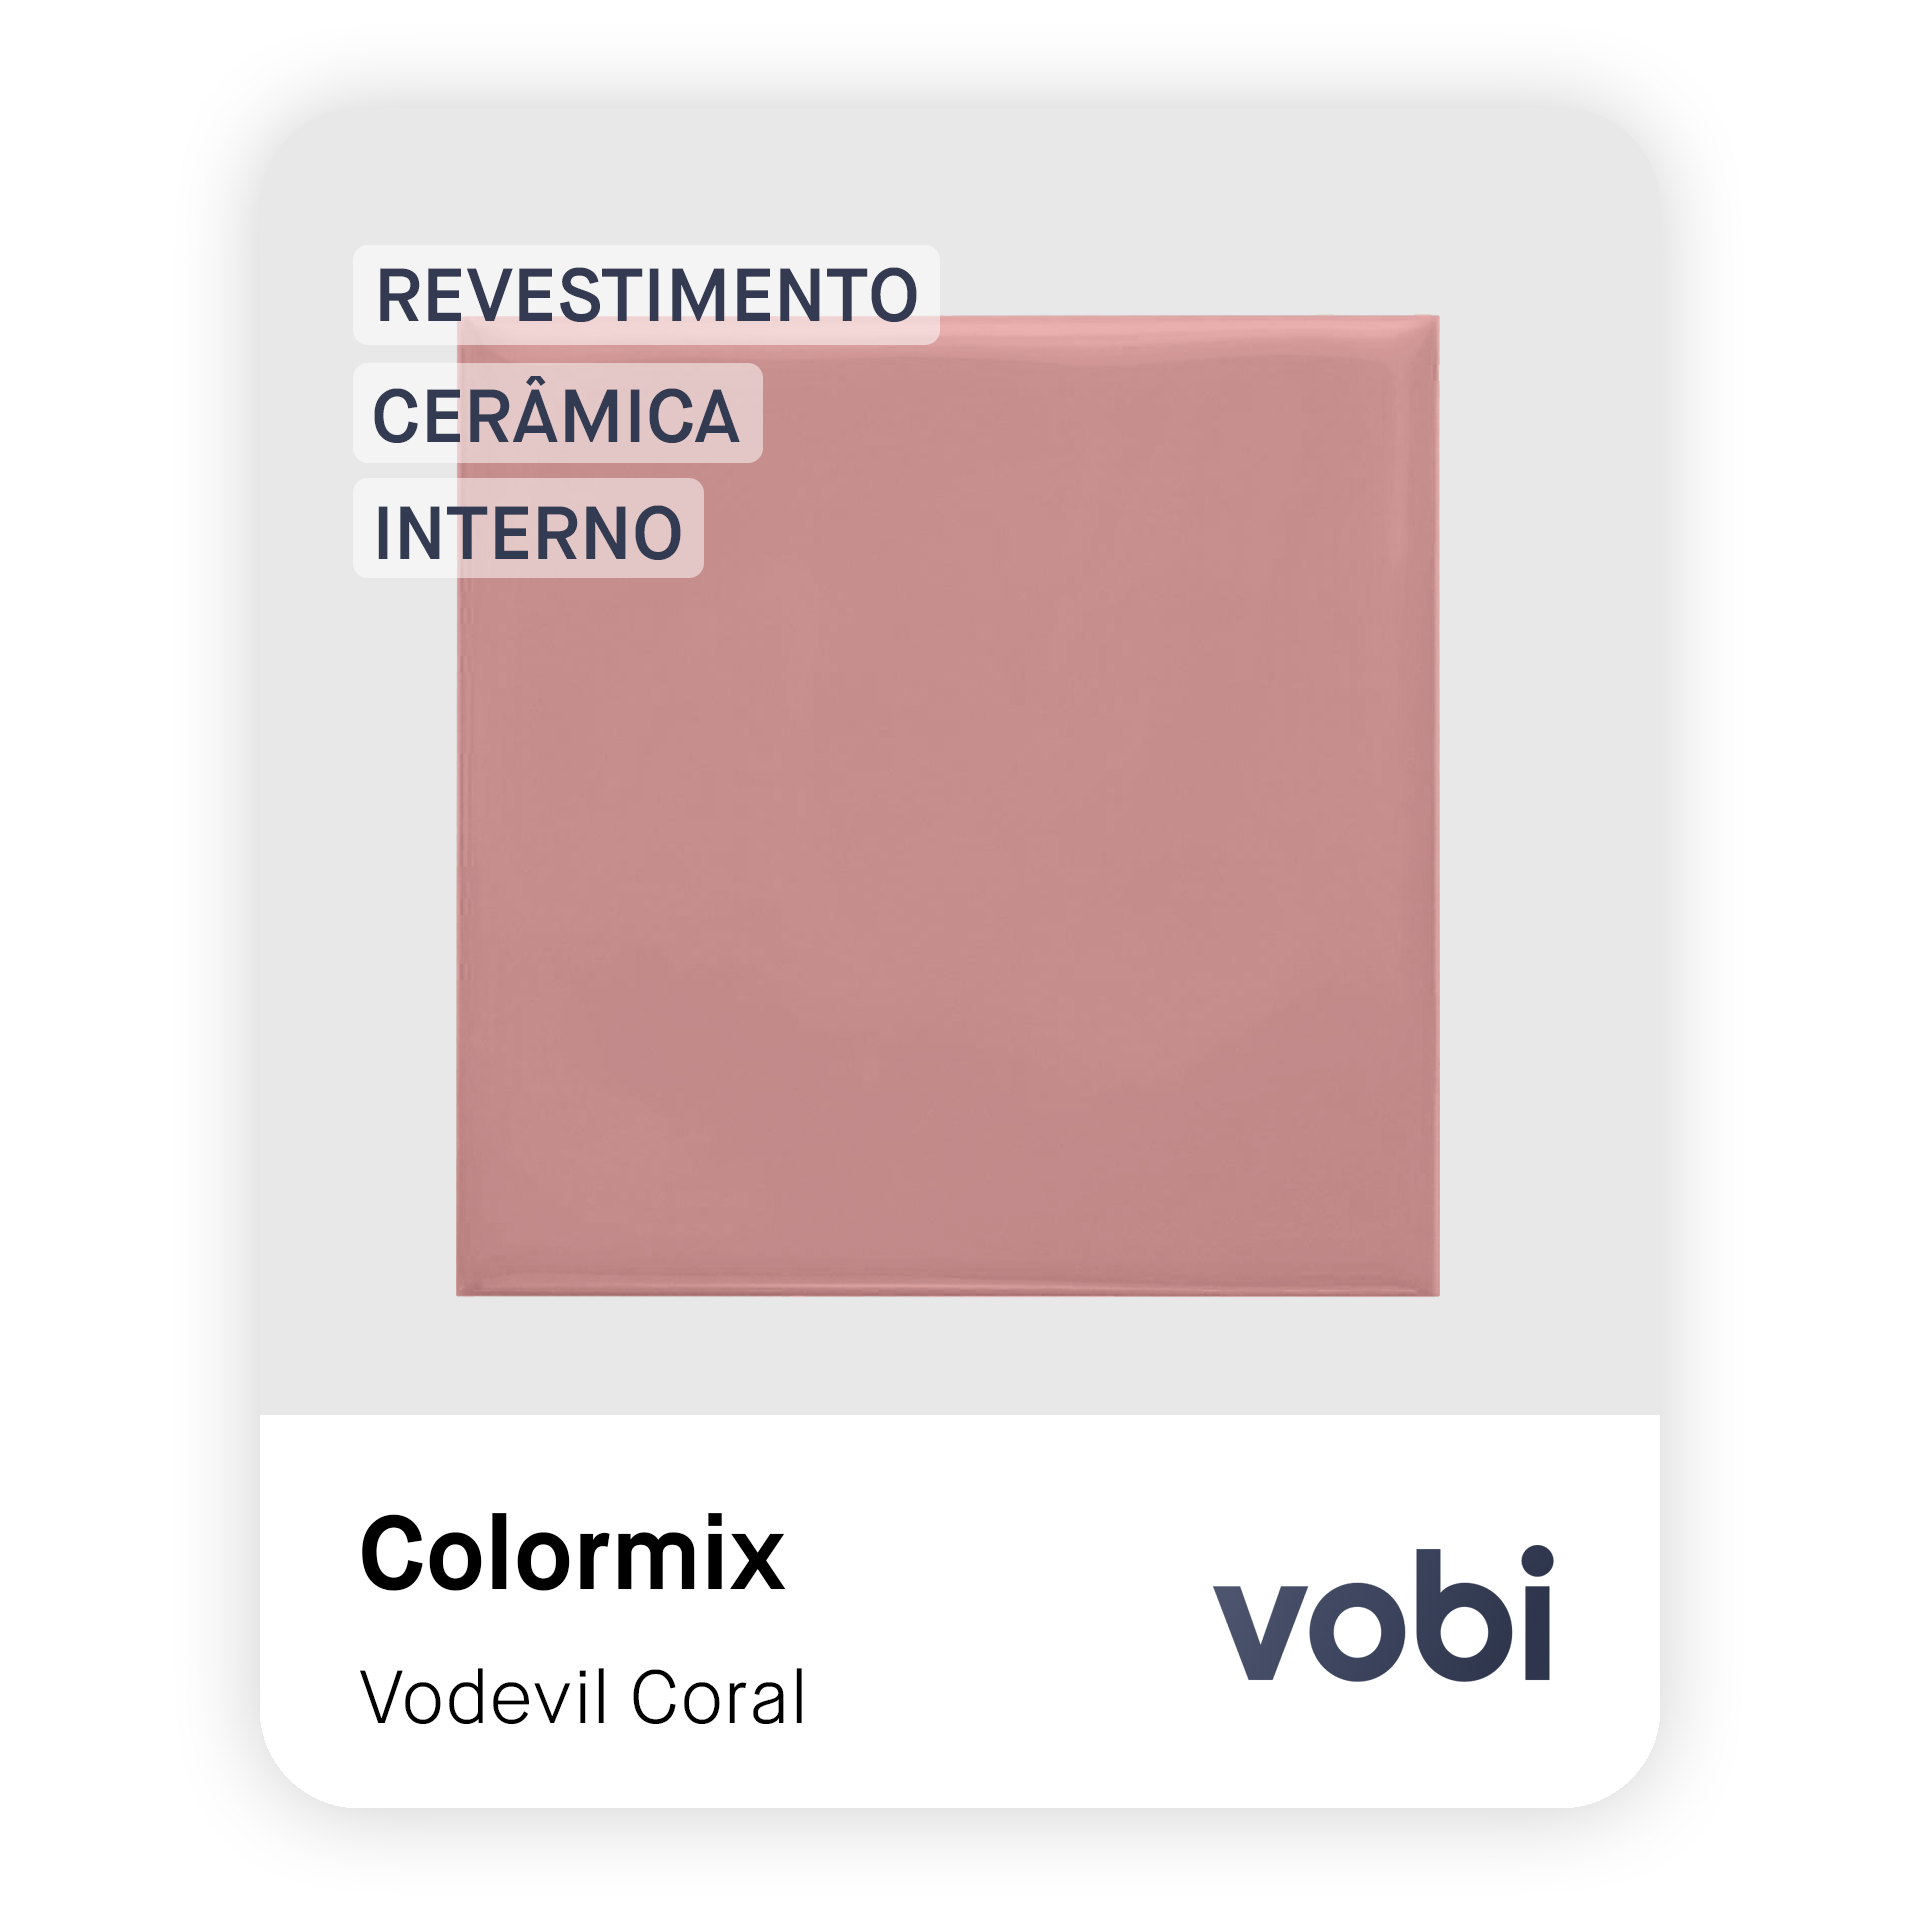 revestimento cerâmica rosa interno